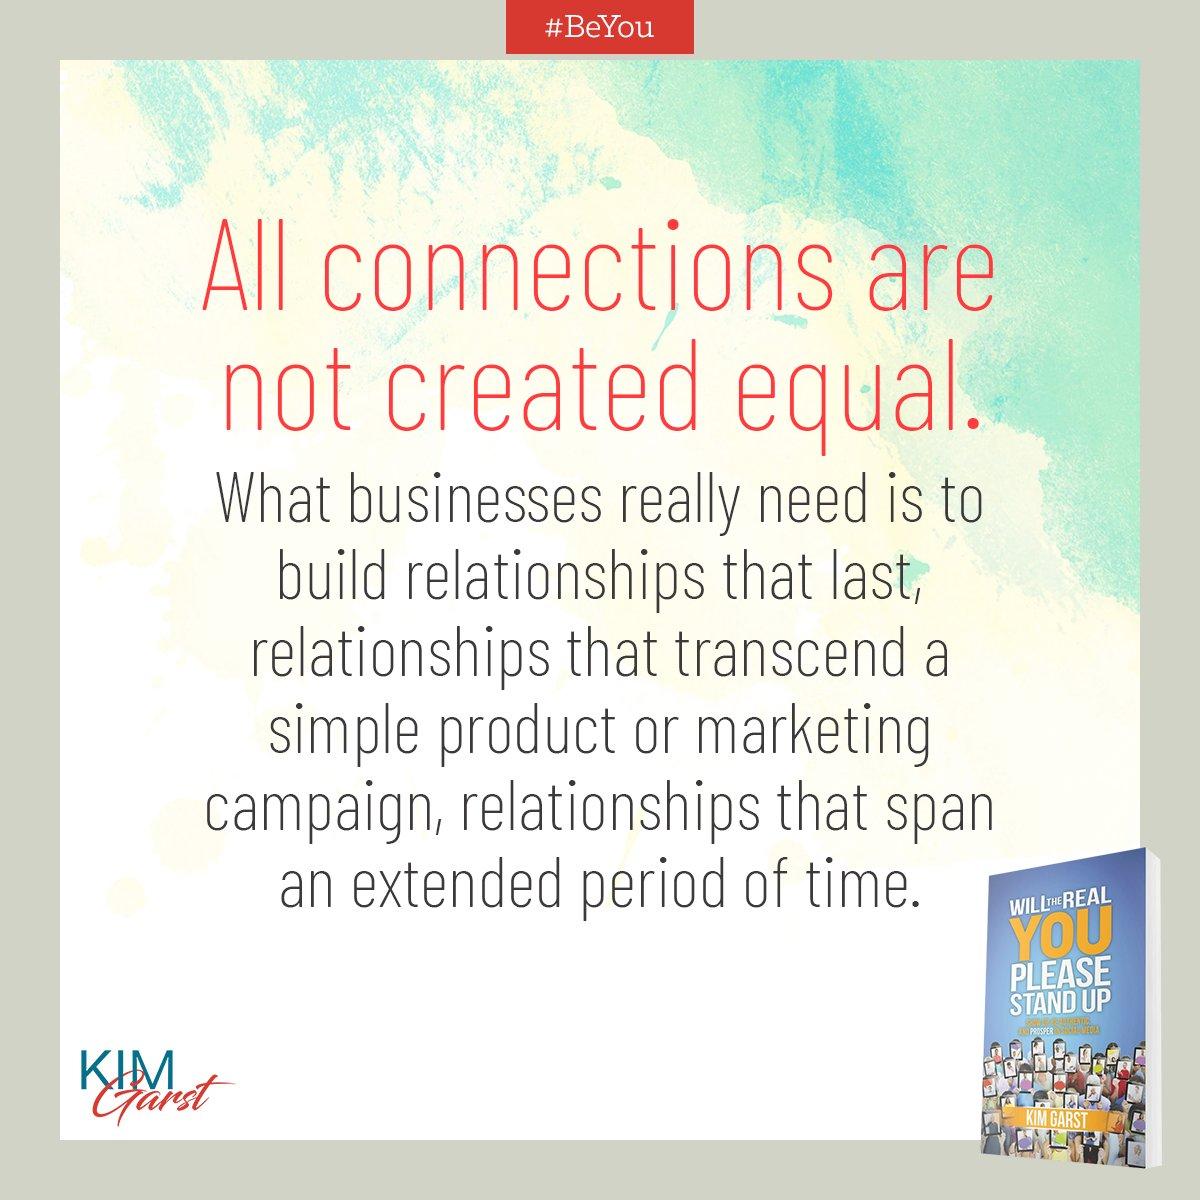 #Biz needs to focus on building relationships that last. #BeYou kimgarst.com/realyoubook